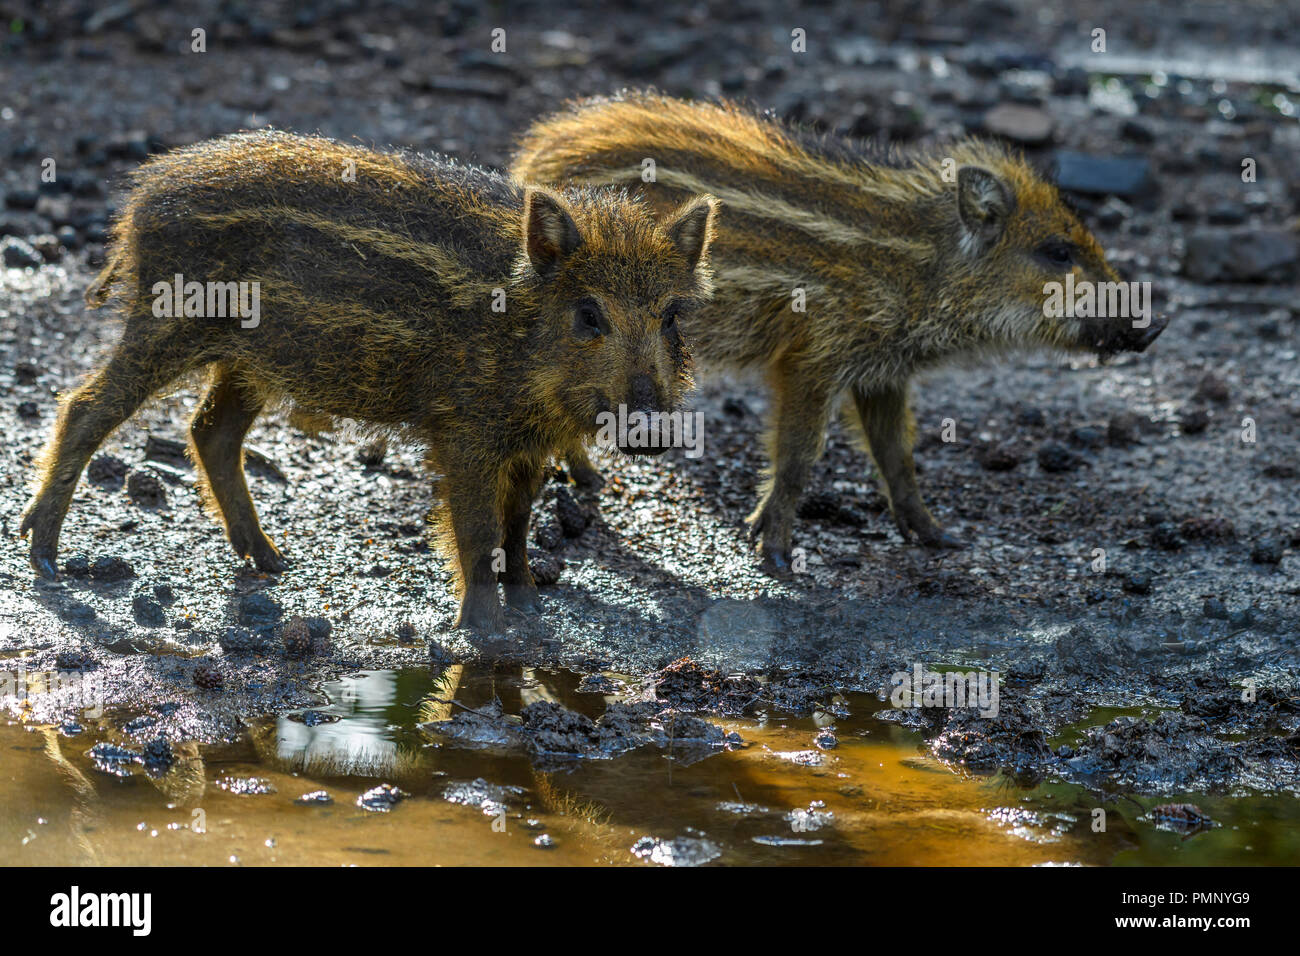 Wild boar, Sus scrofa, two piglets, Hesse, Germany - Stock Image